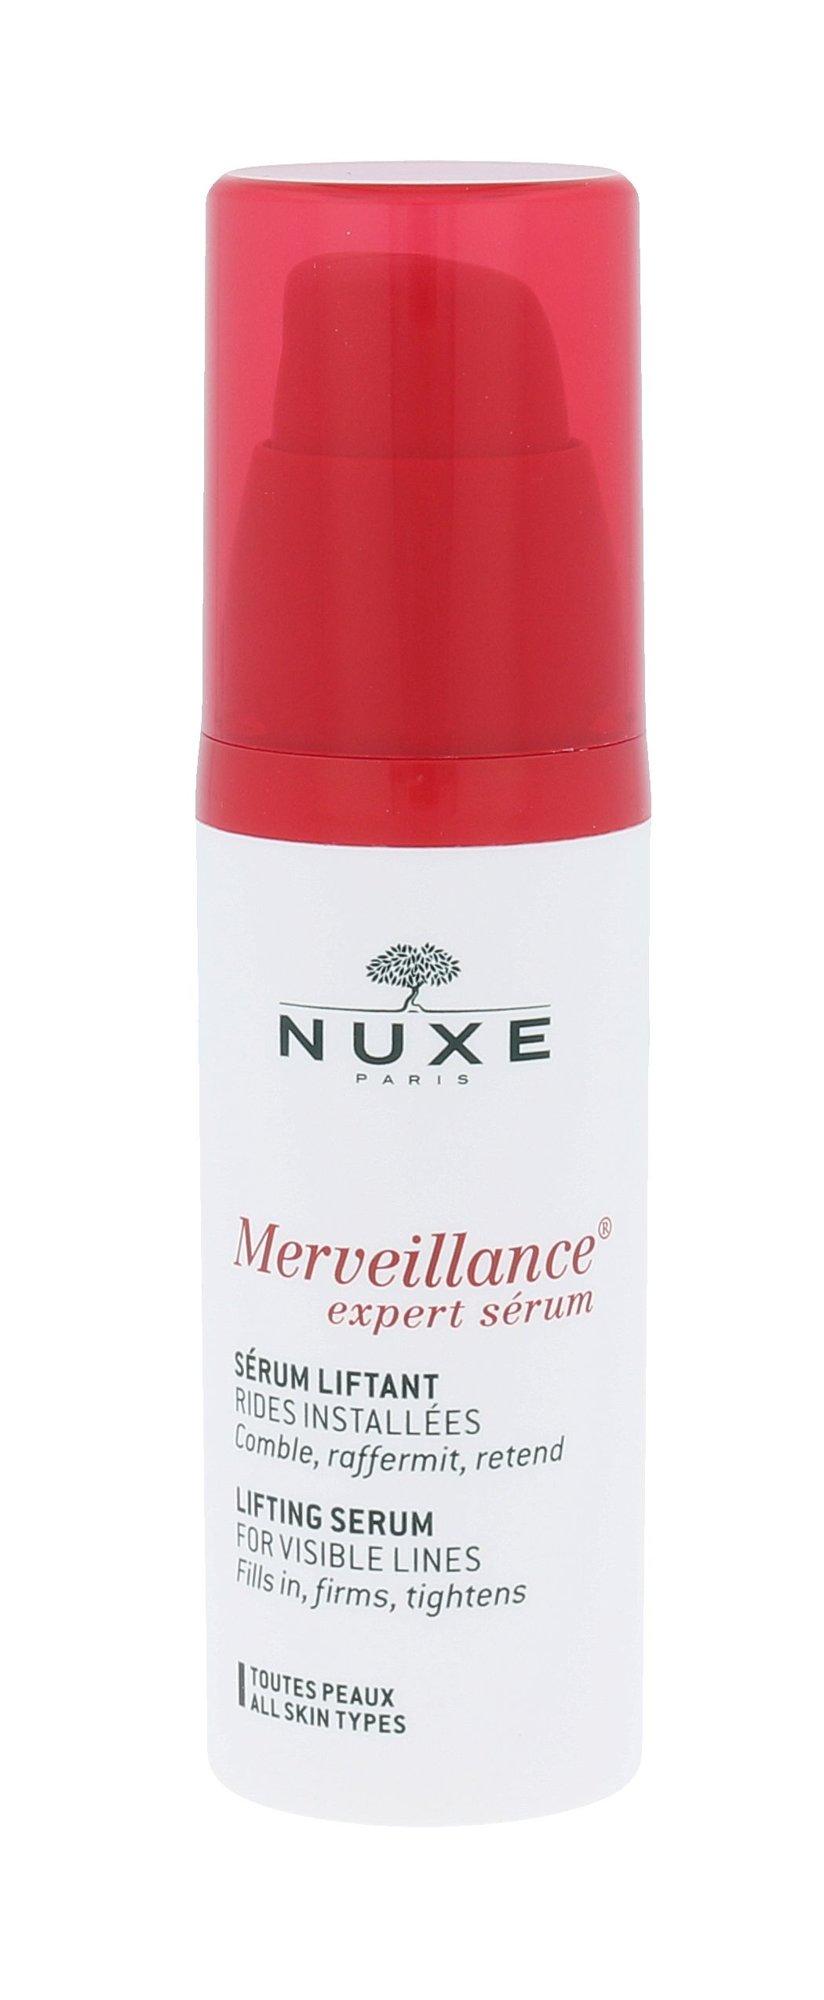 NUXE Merveillance Cosmetic 30ml